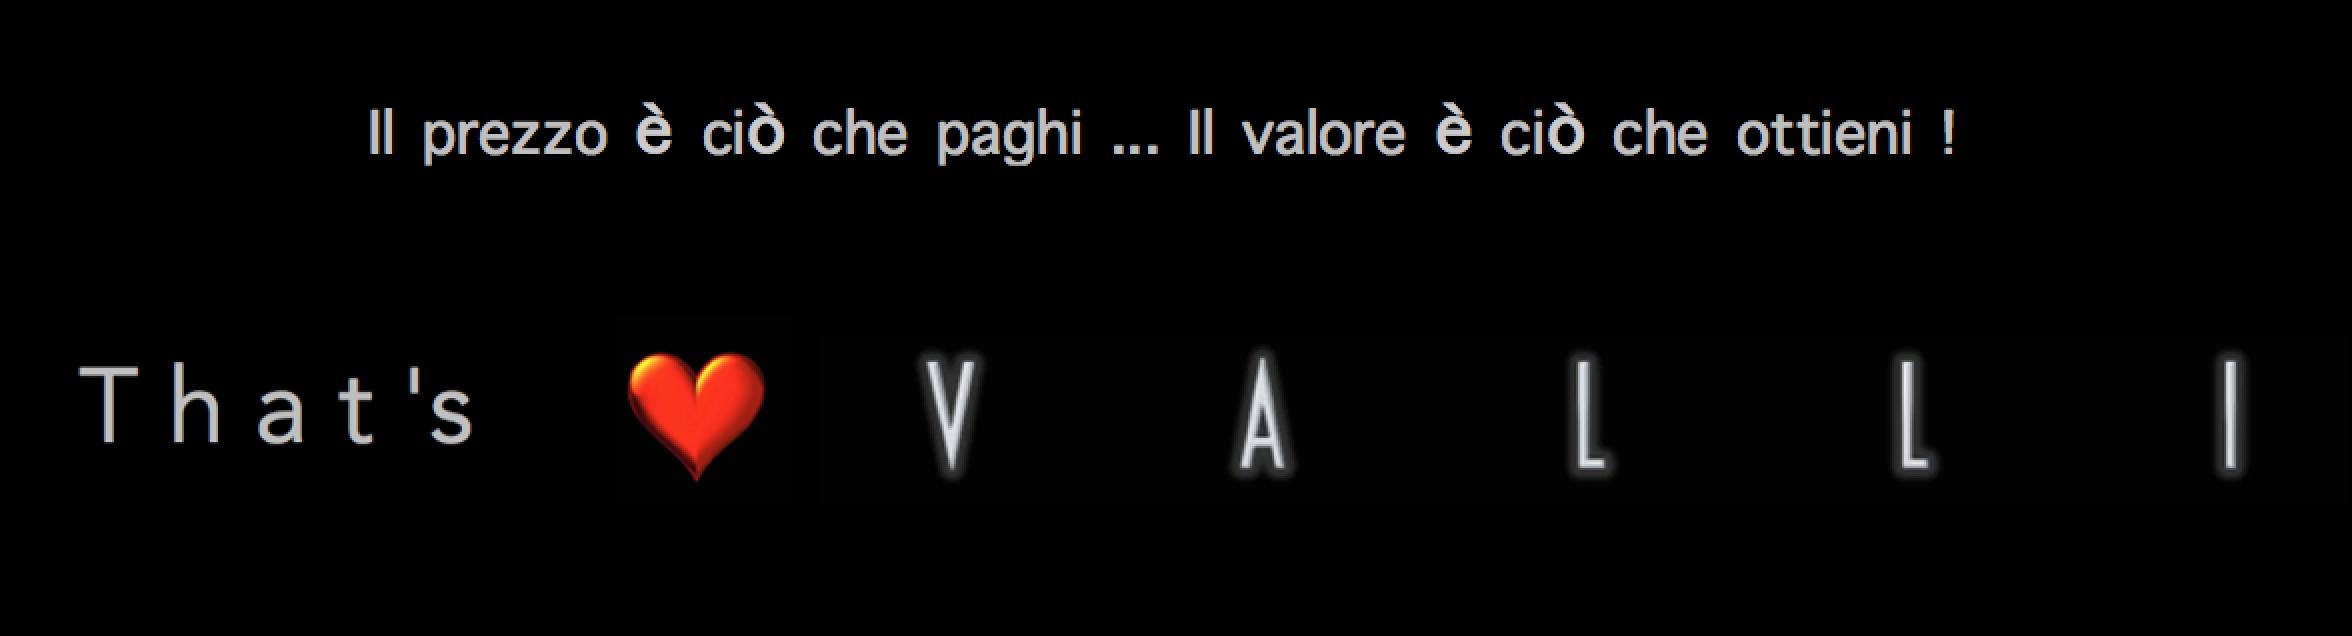 #maurovalli